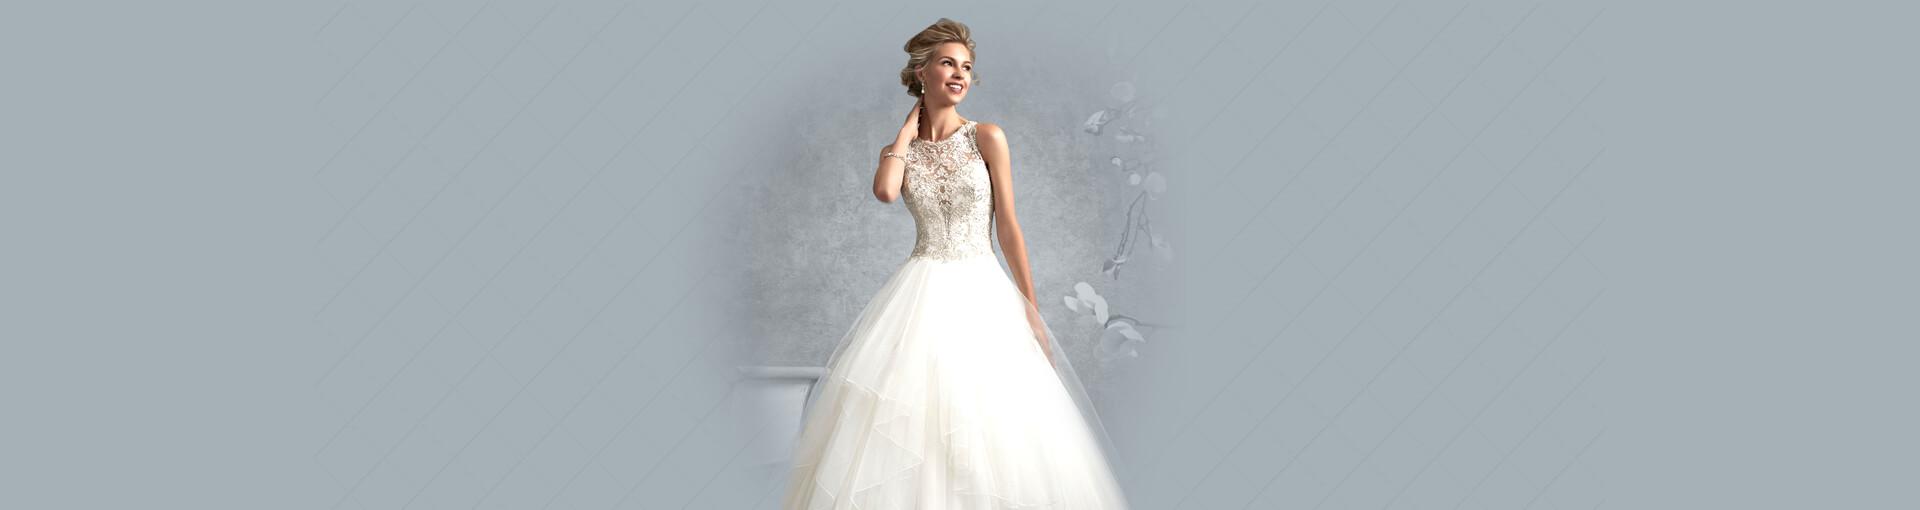 Location robe mariage quebec